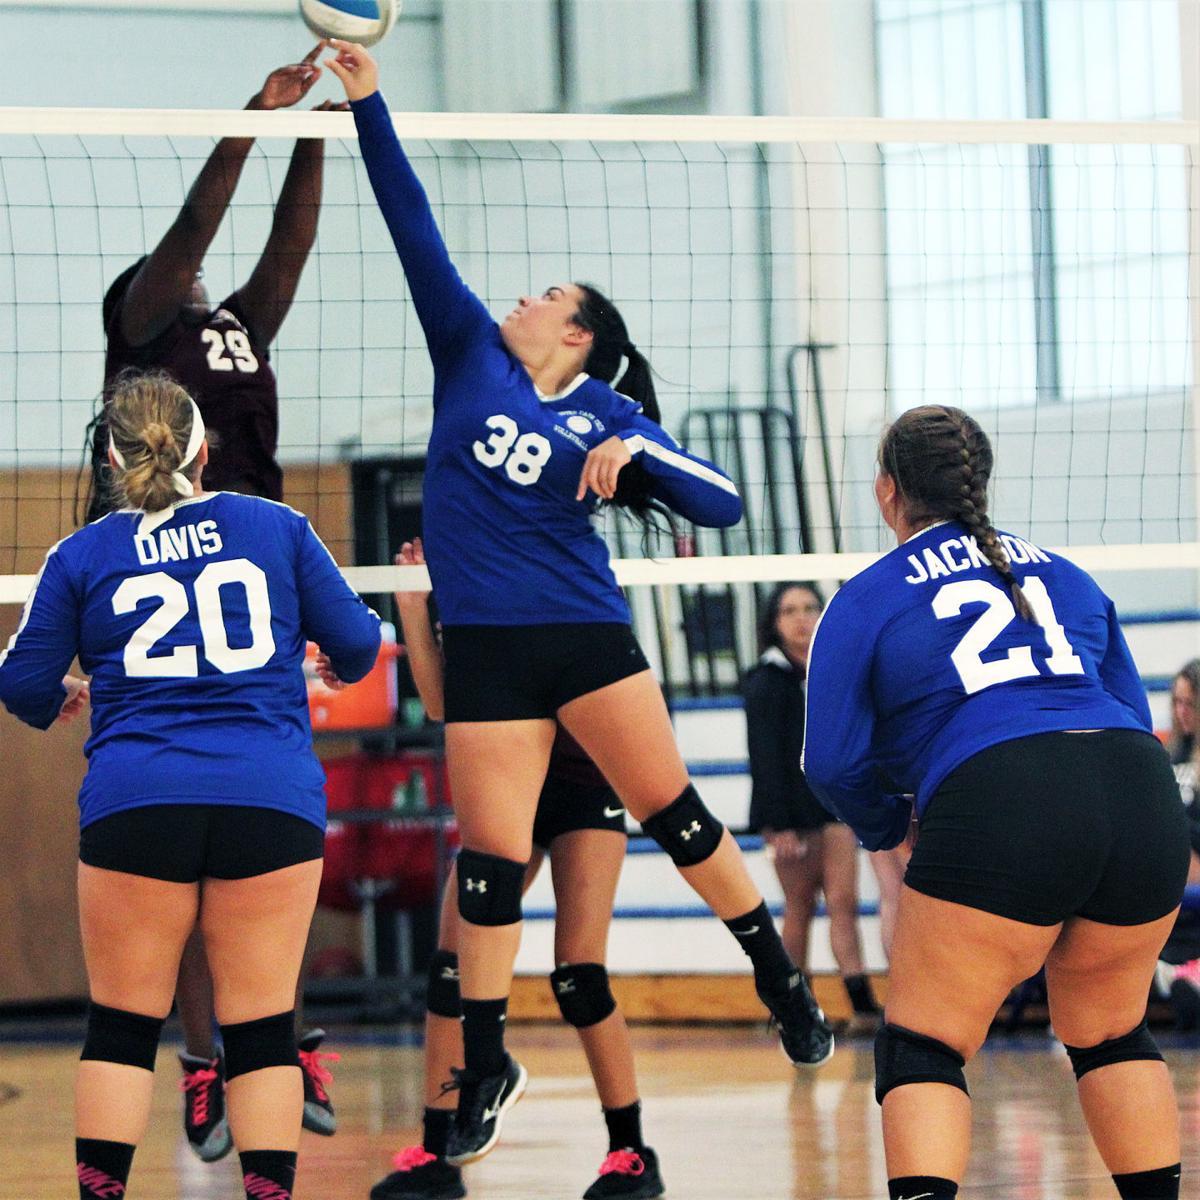 UCT Volleyball vs. West Bridgewater — September 30, 2019